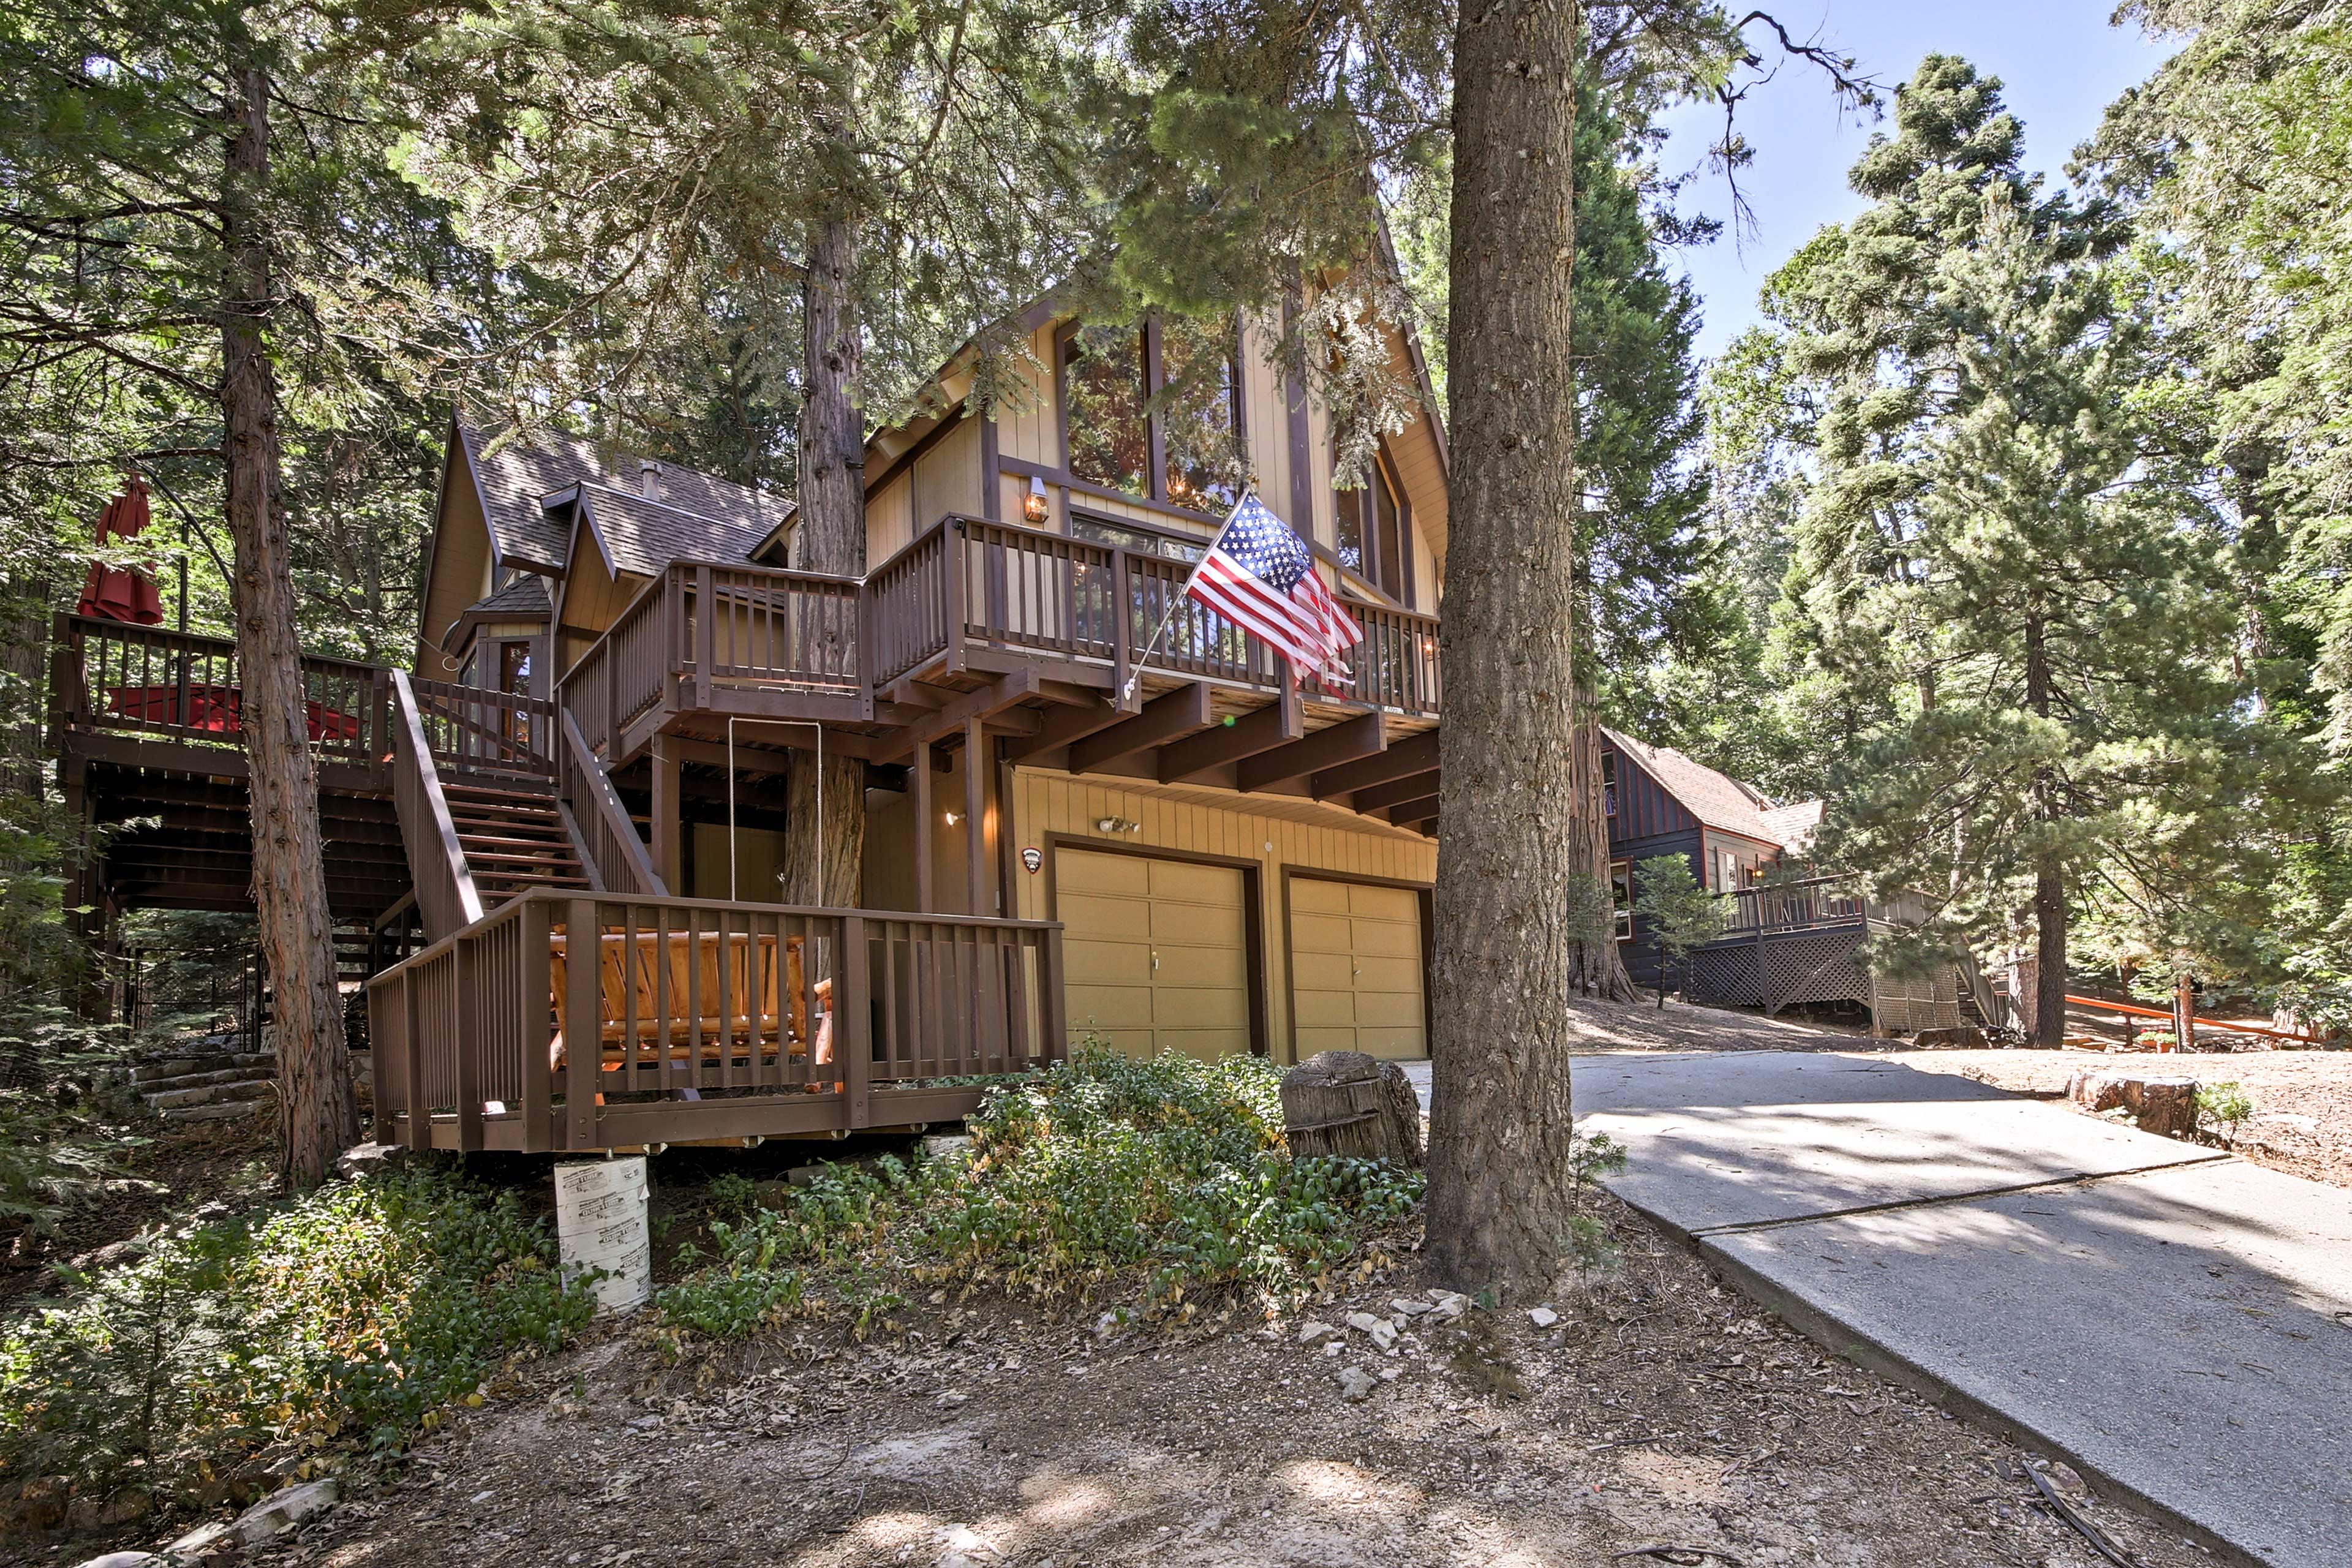 The 4-bedroom, 3-bathroom house has a wraparound deck, hammock and hot tub.